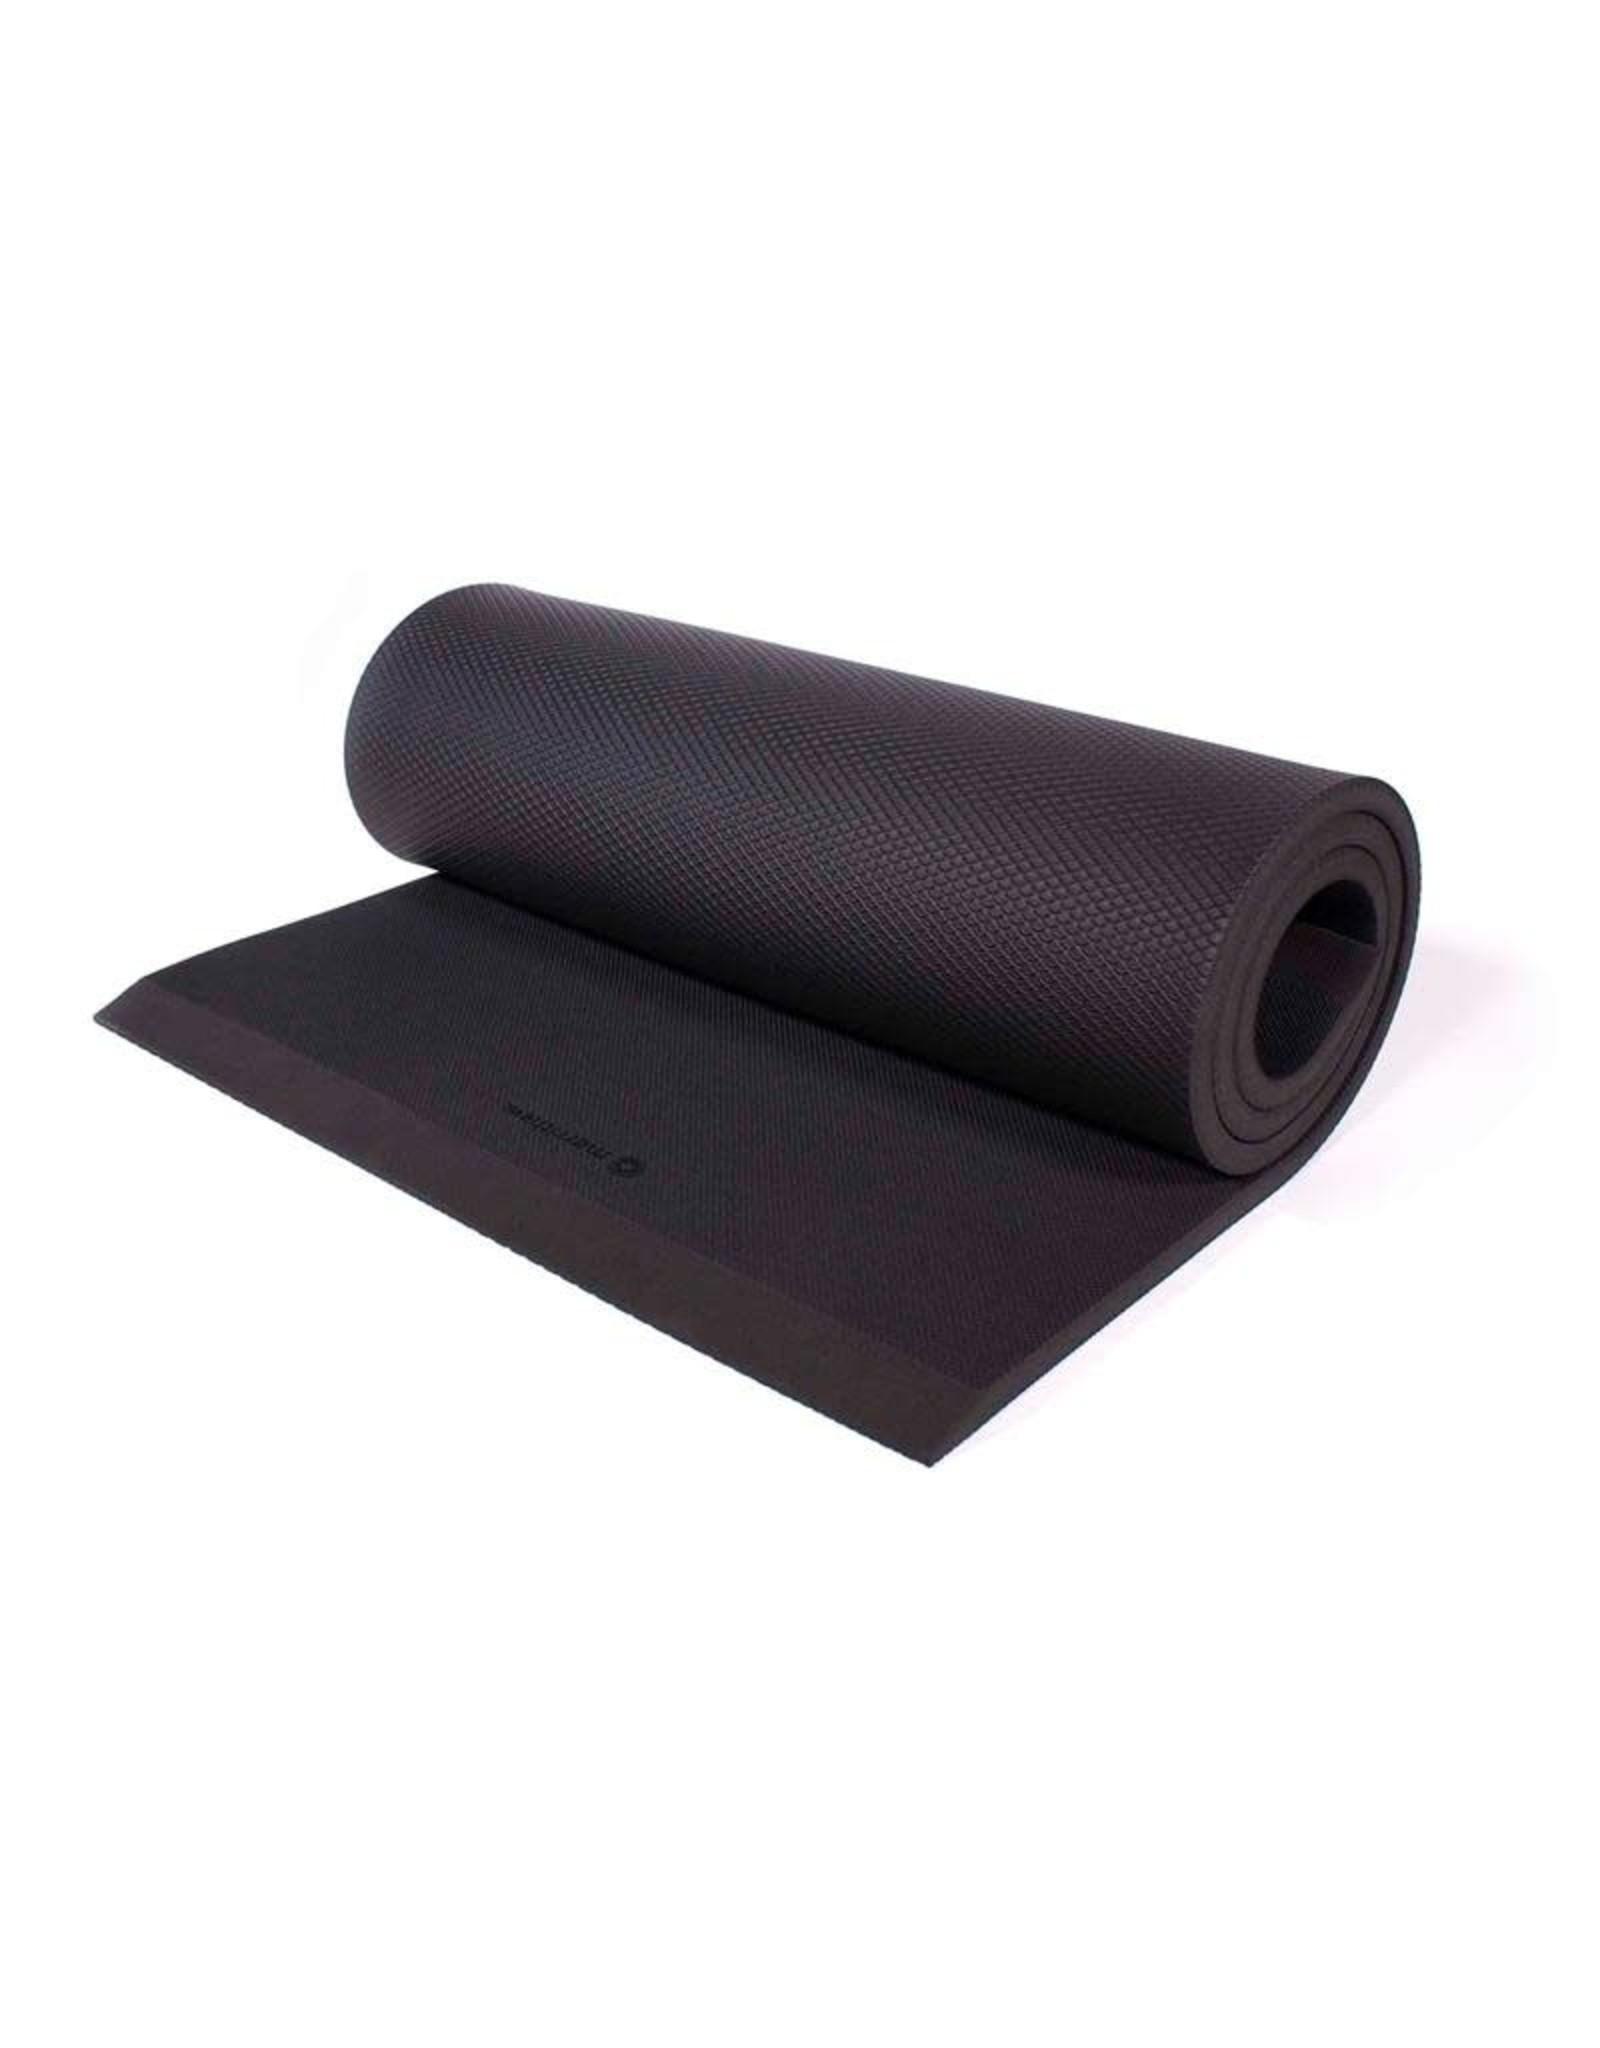 MERRITHEW Eco-Lux Imprint Mat PRO (black)